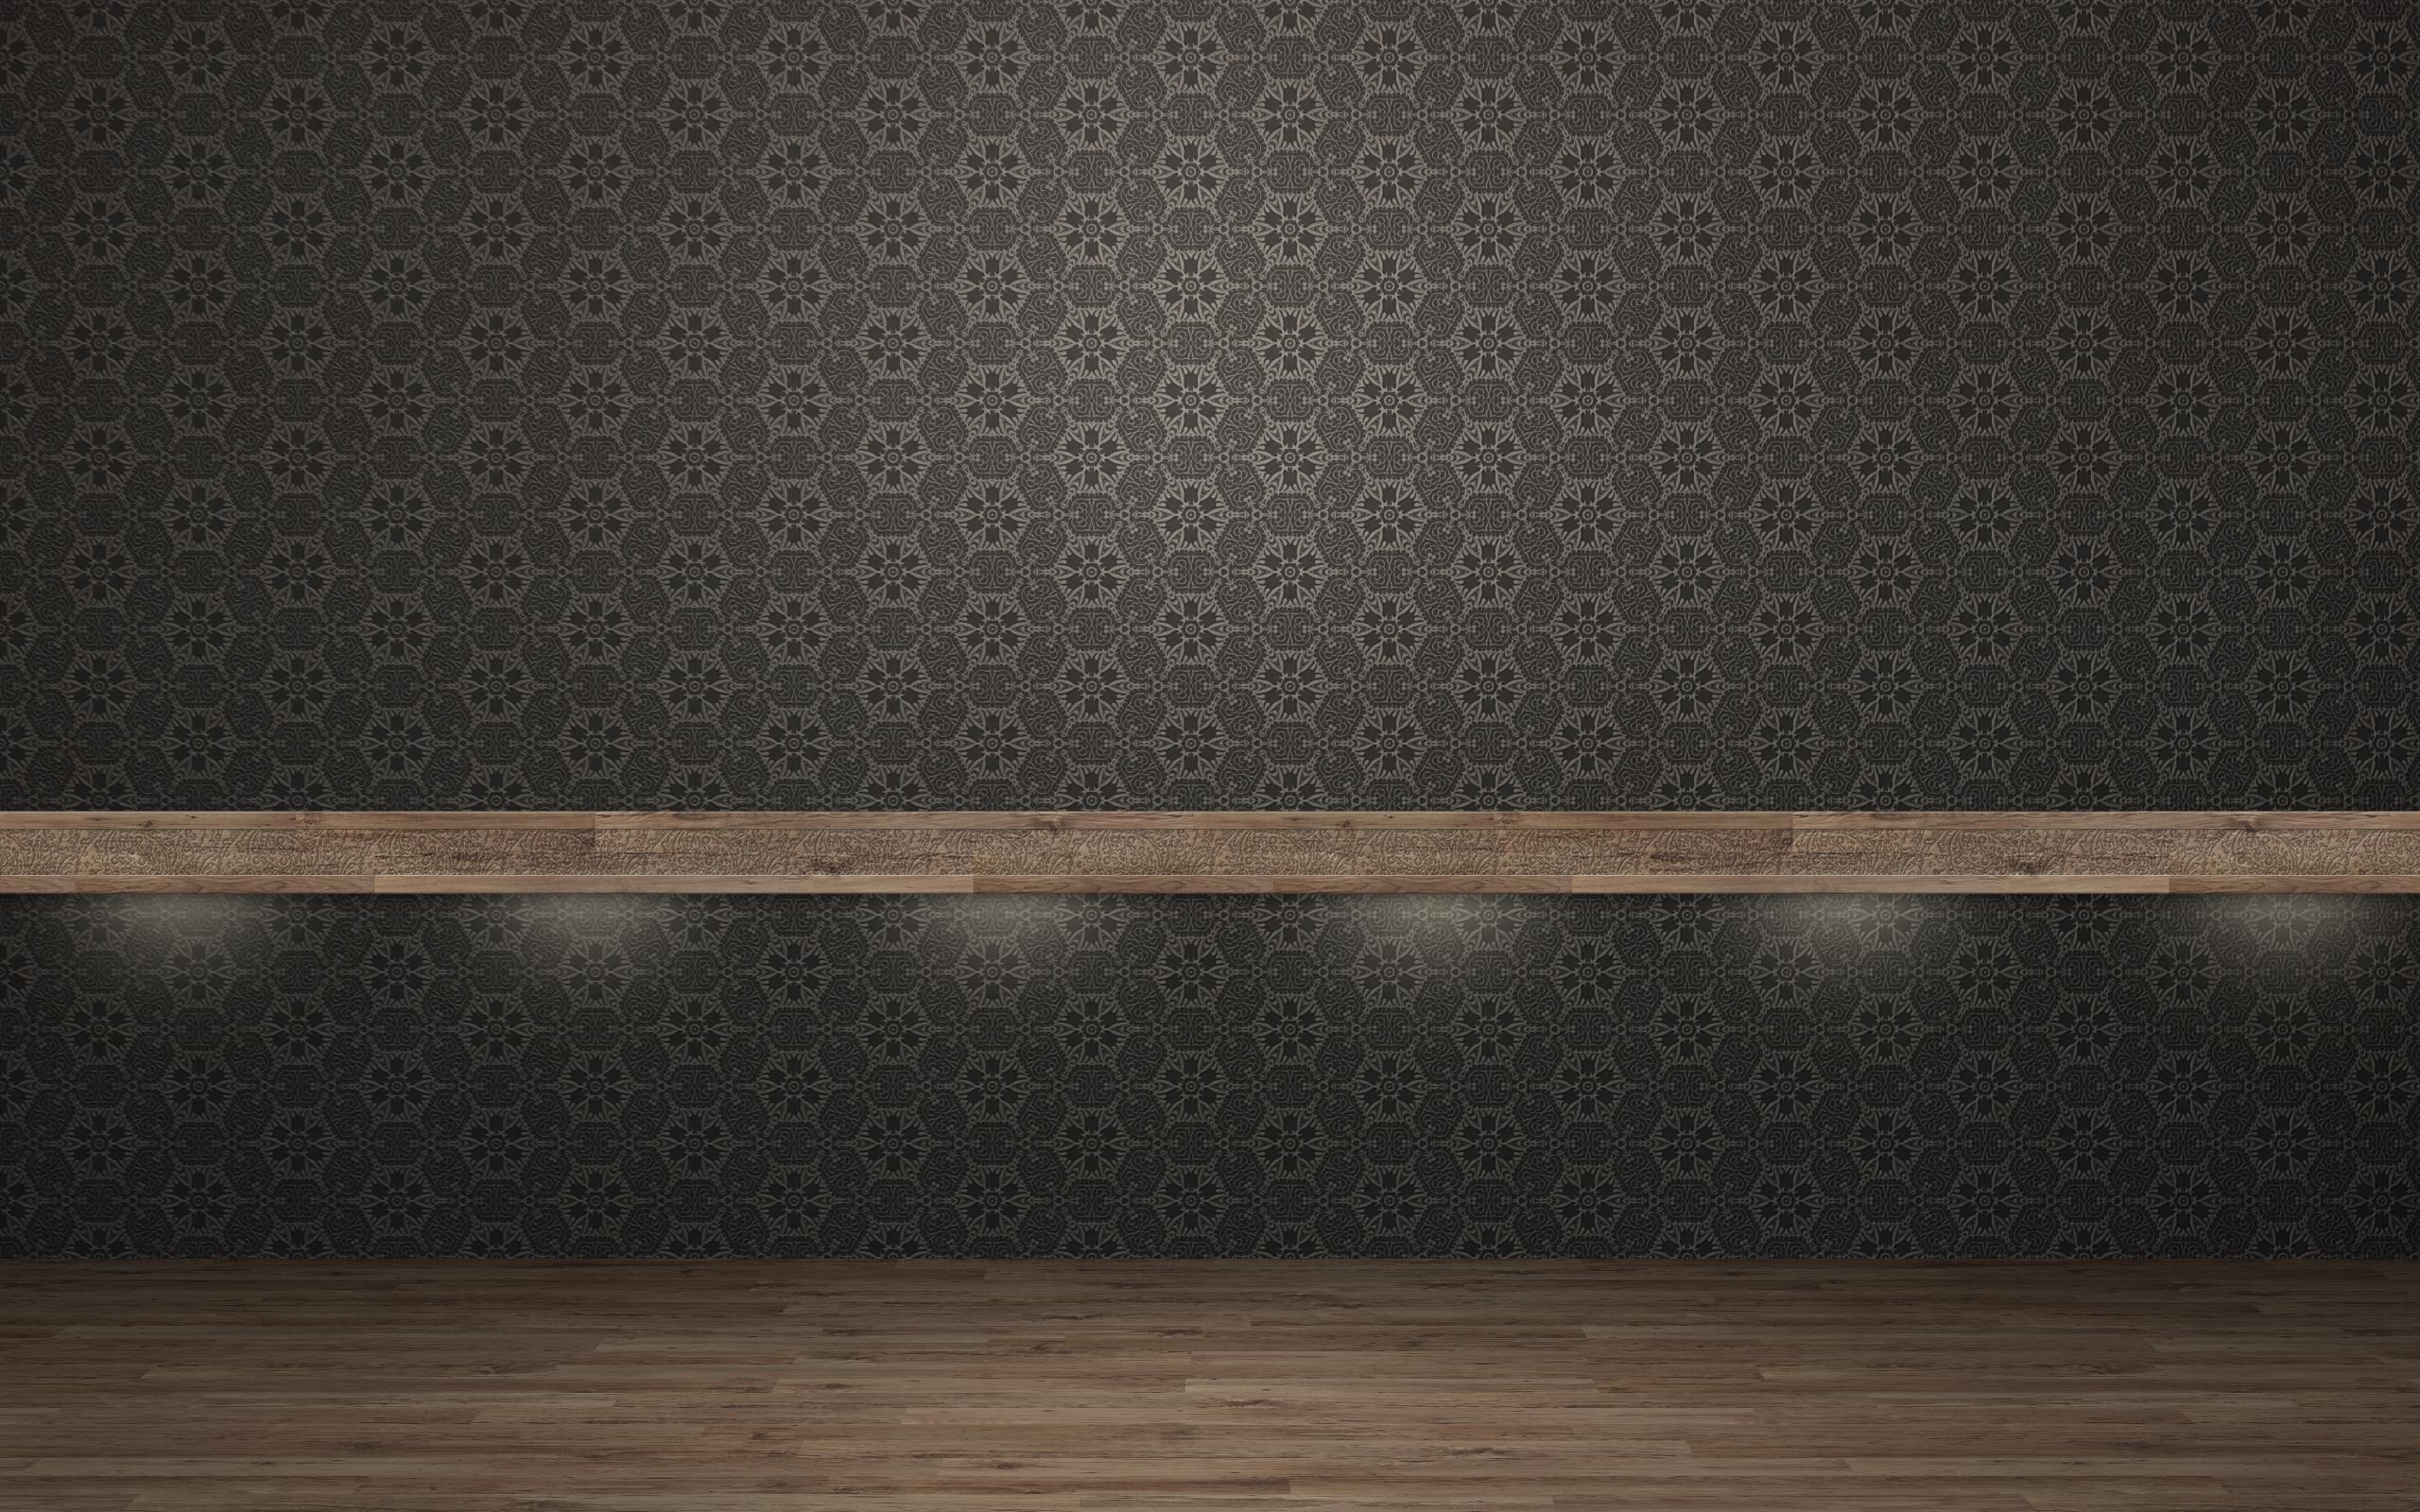 3d animation wallpaper for desktop